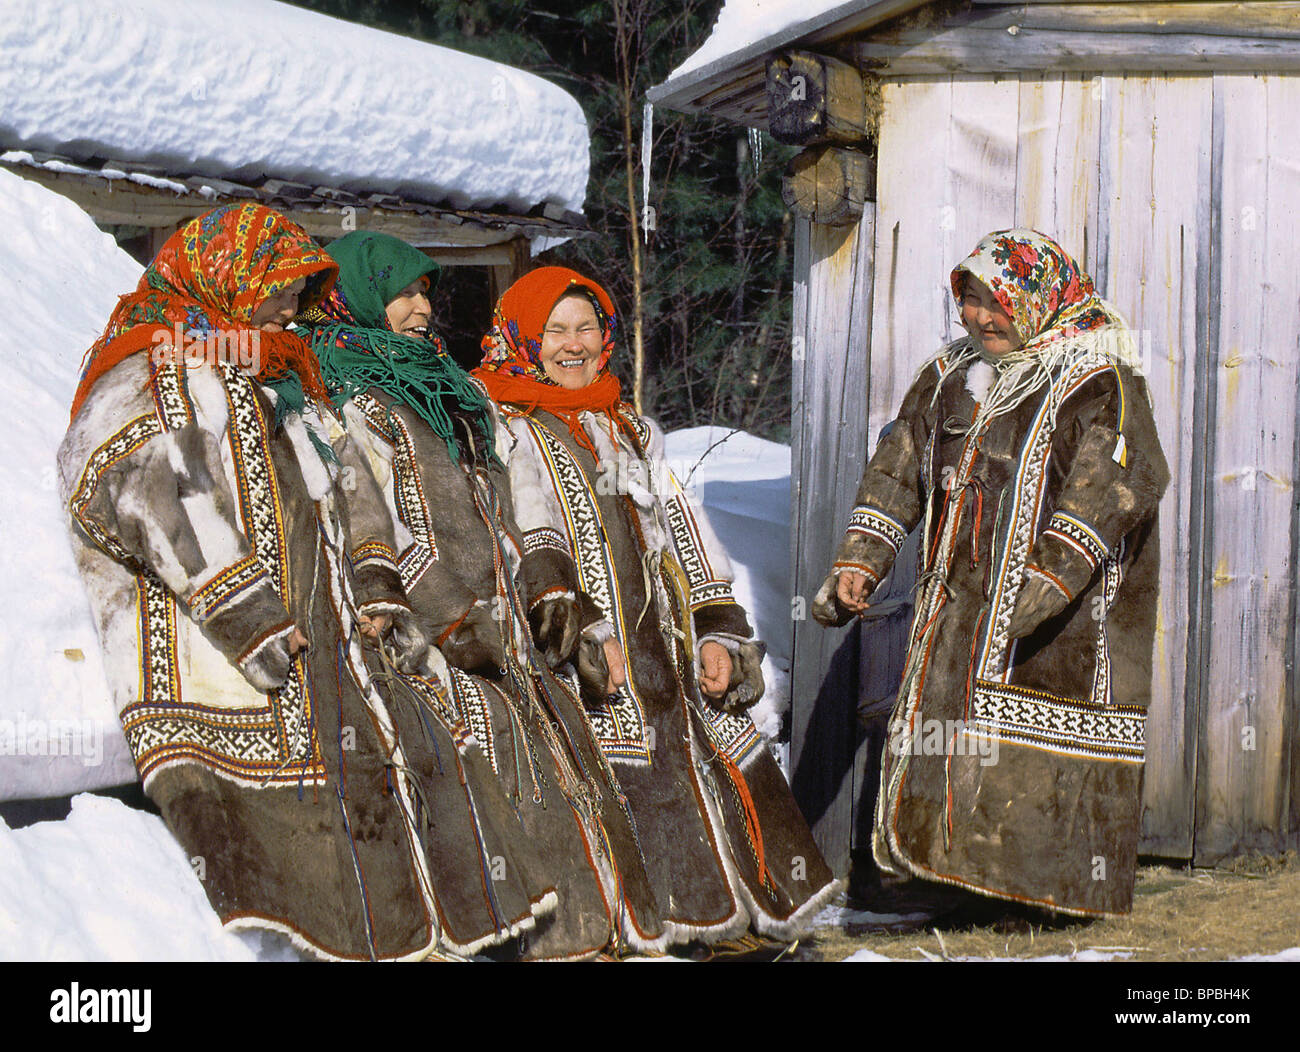 Khanty women in their national dress Stock Photo